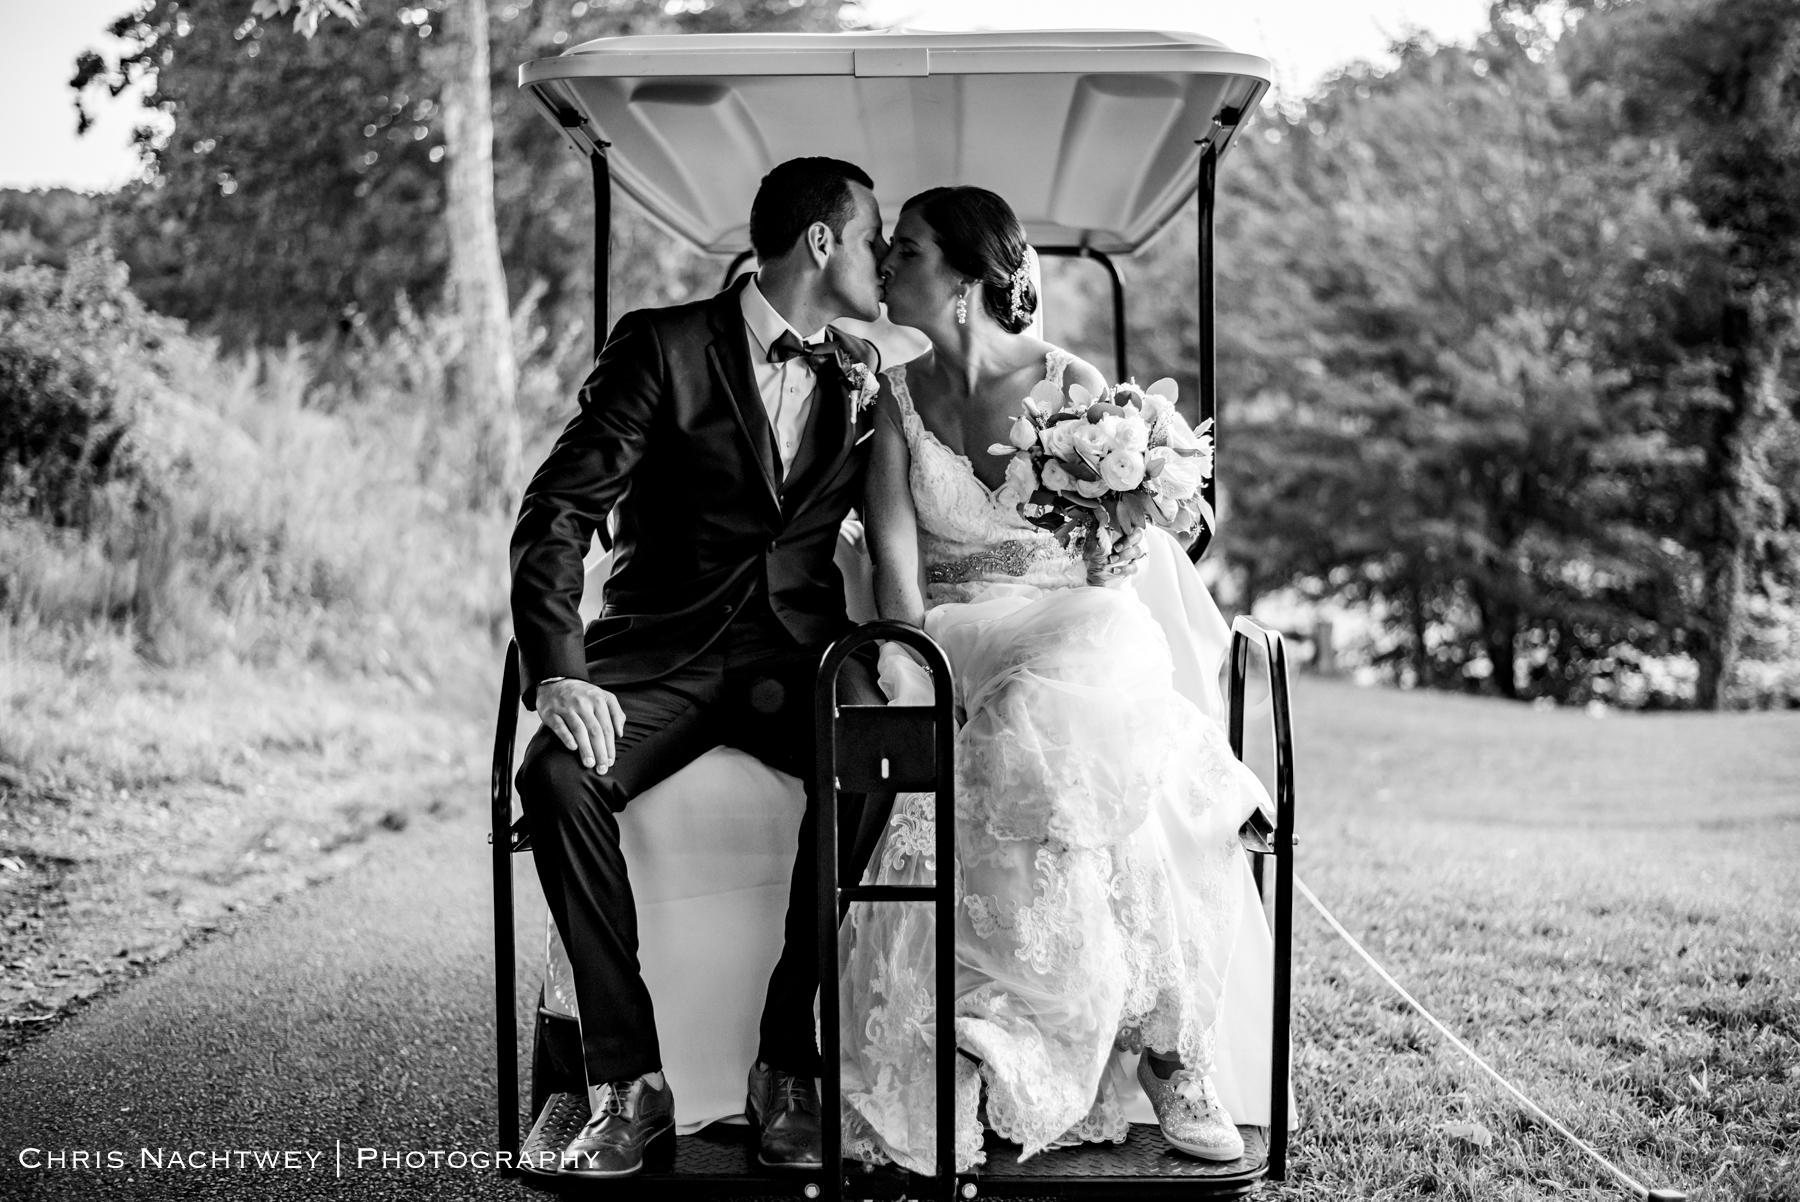 wedding-lake-of-isles-photos-chris-nachtwey-photography-2019-44.jpg